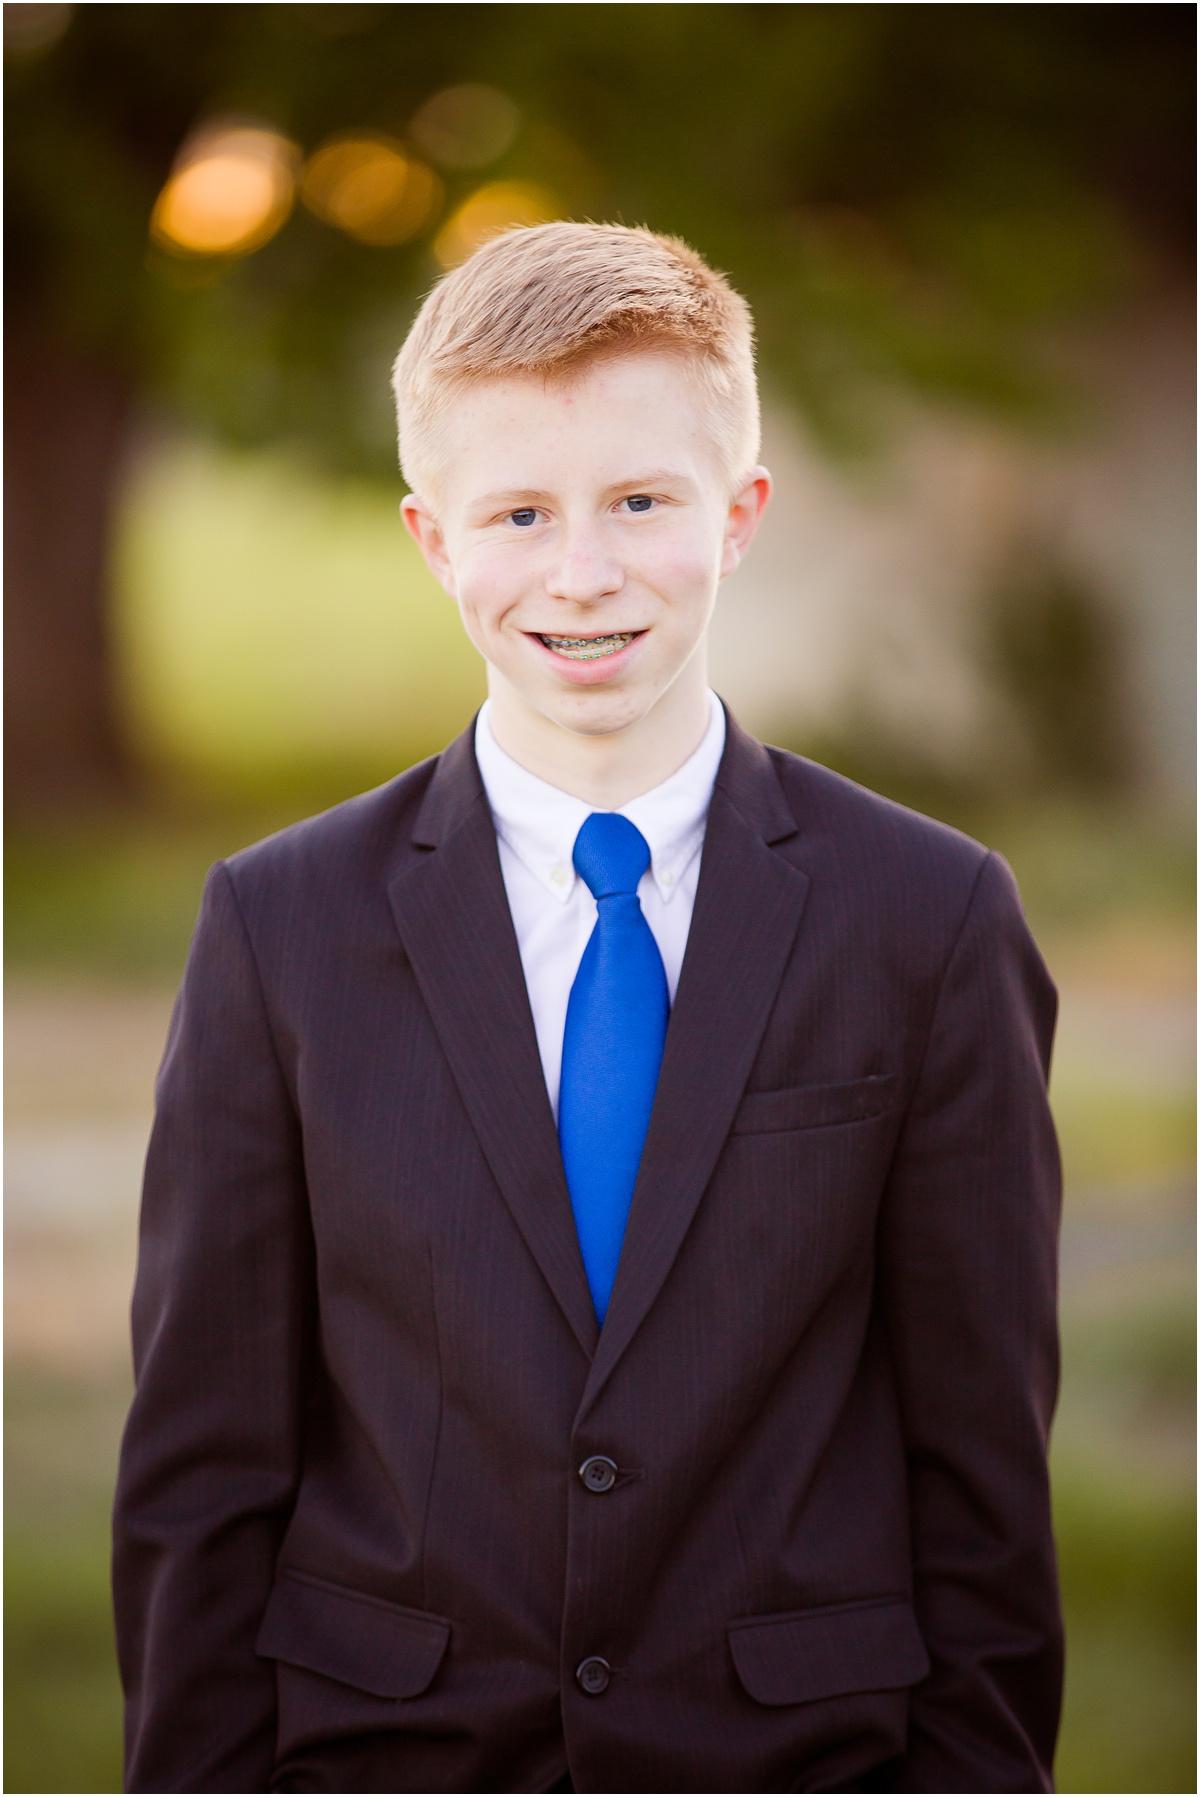 Portraits_Child Photography_Meridian Idaho__Leah Southwick Photography_0057.jpg